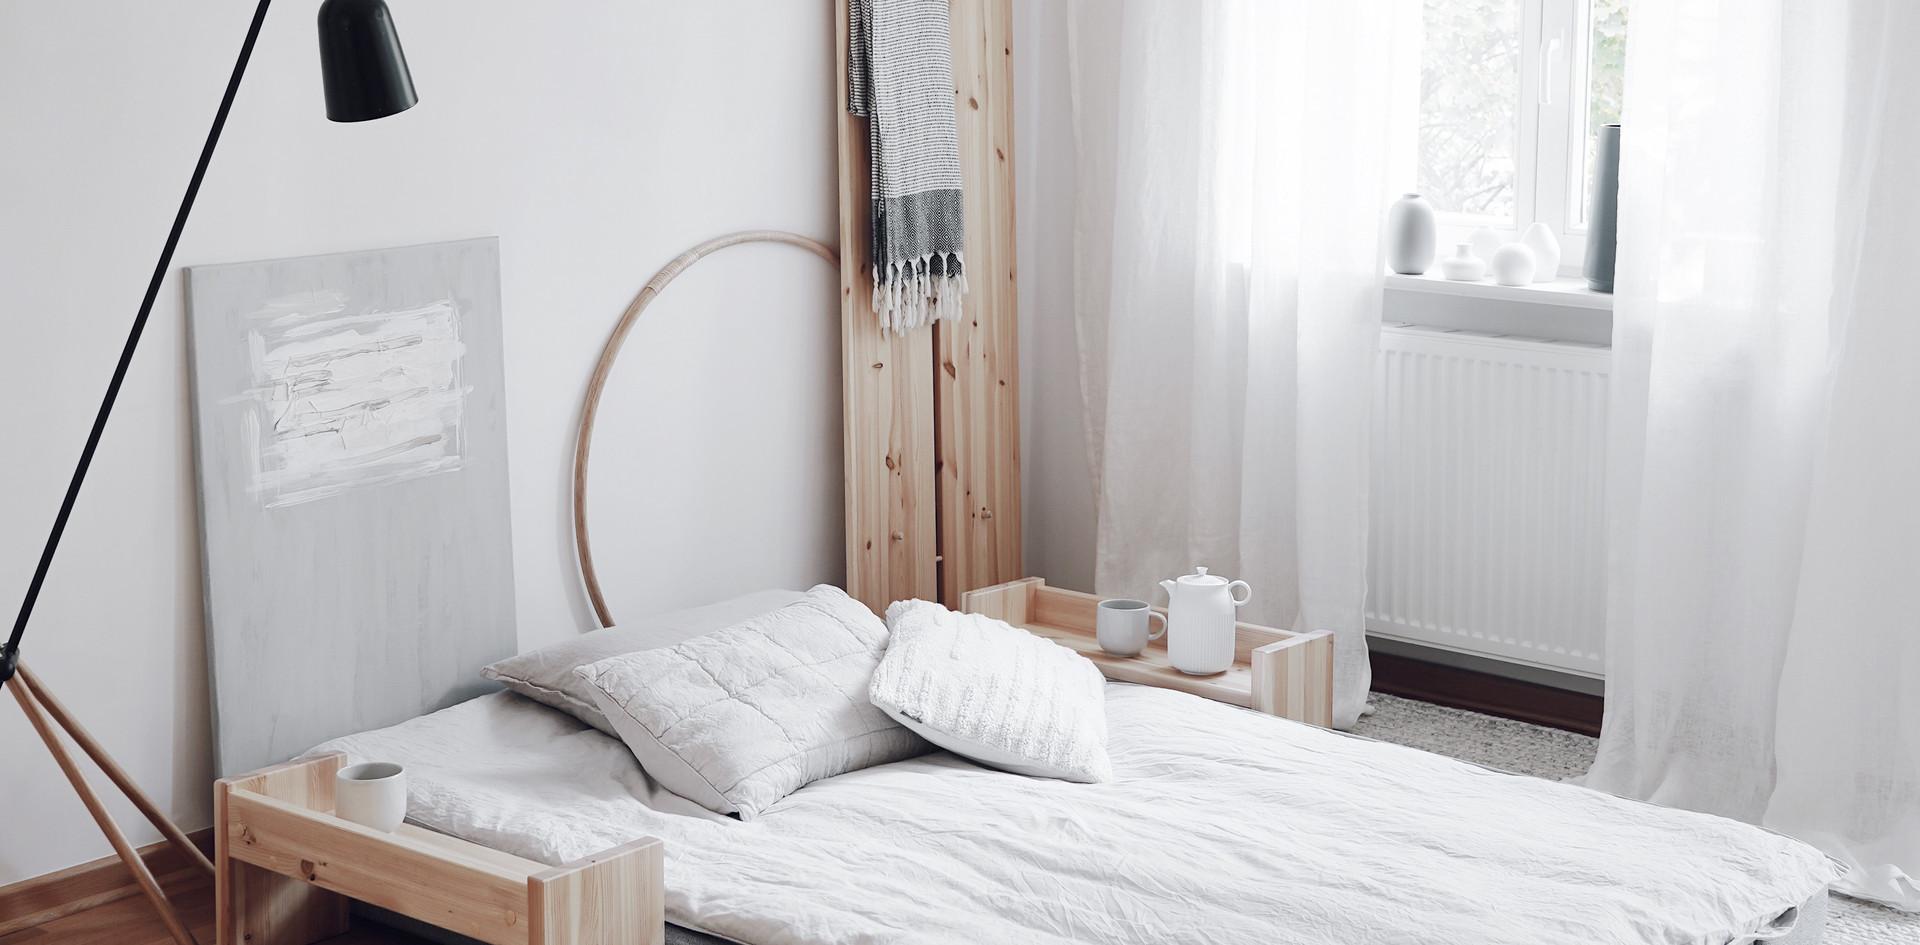 diplos kanapes krevati me stroma 125 X 200